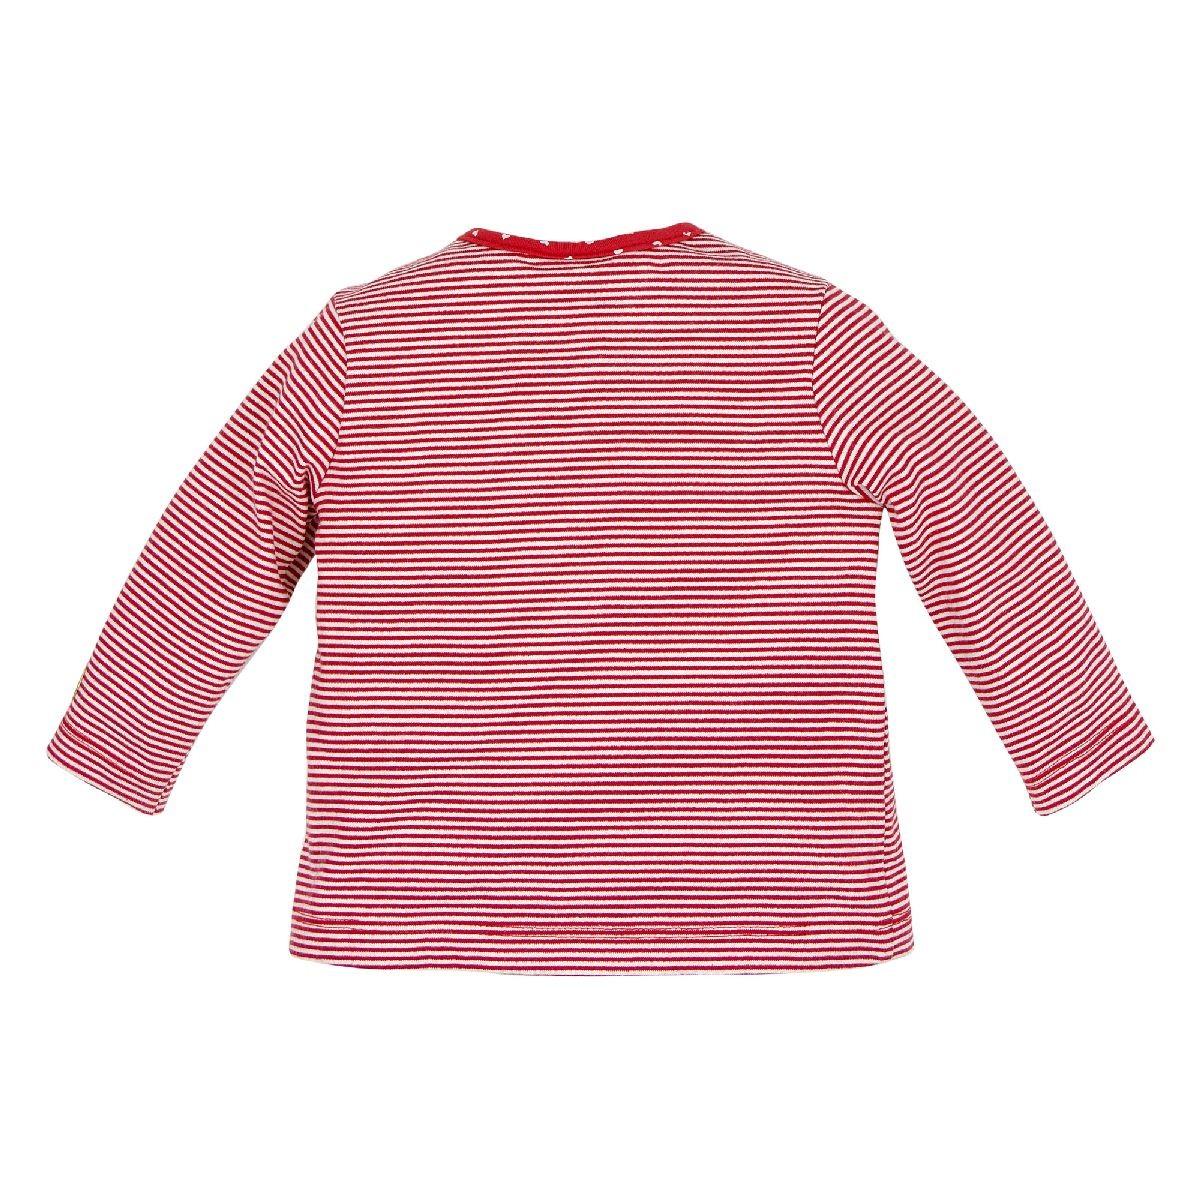 Kinder T-shirt gekruld 'i mog di'